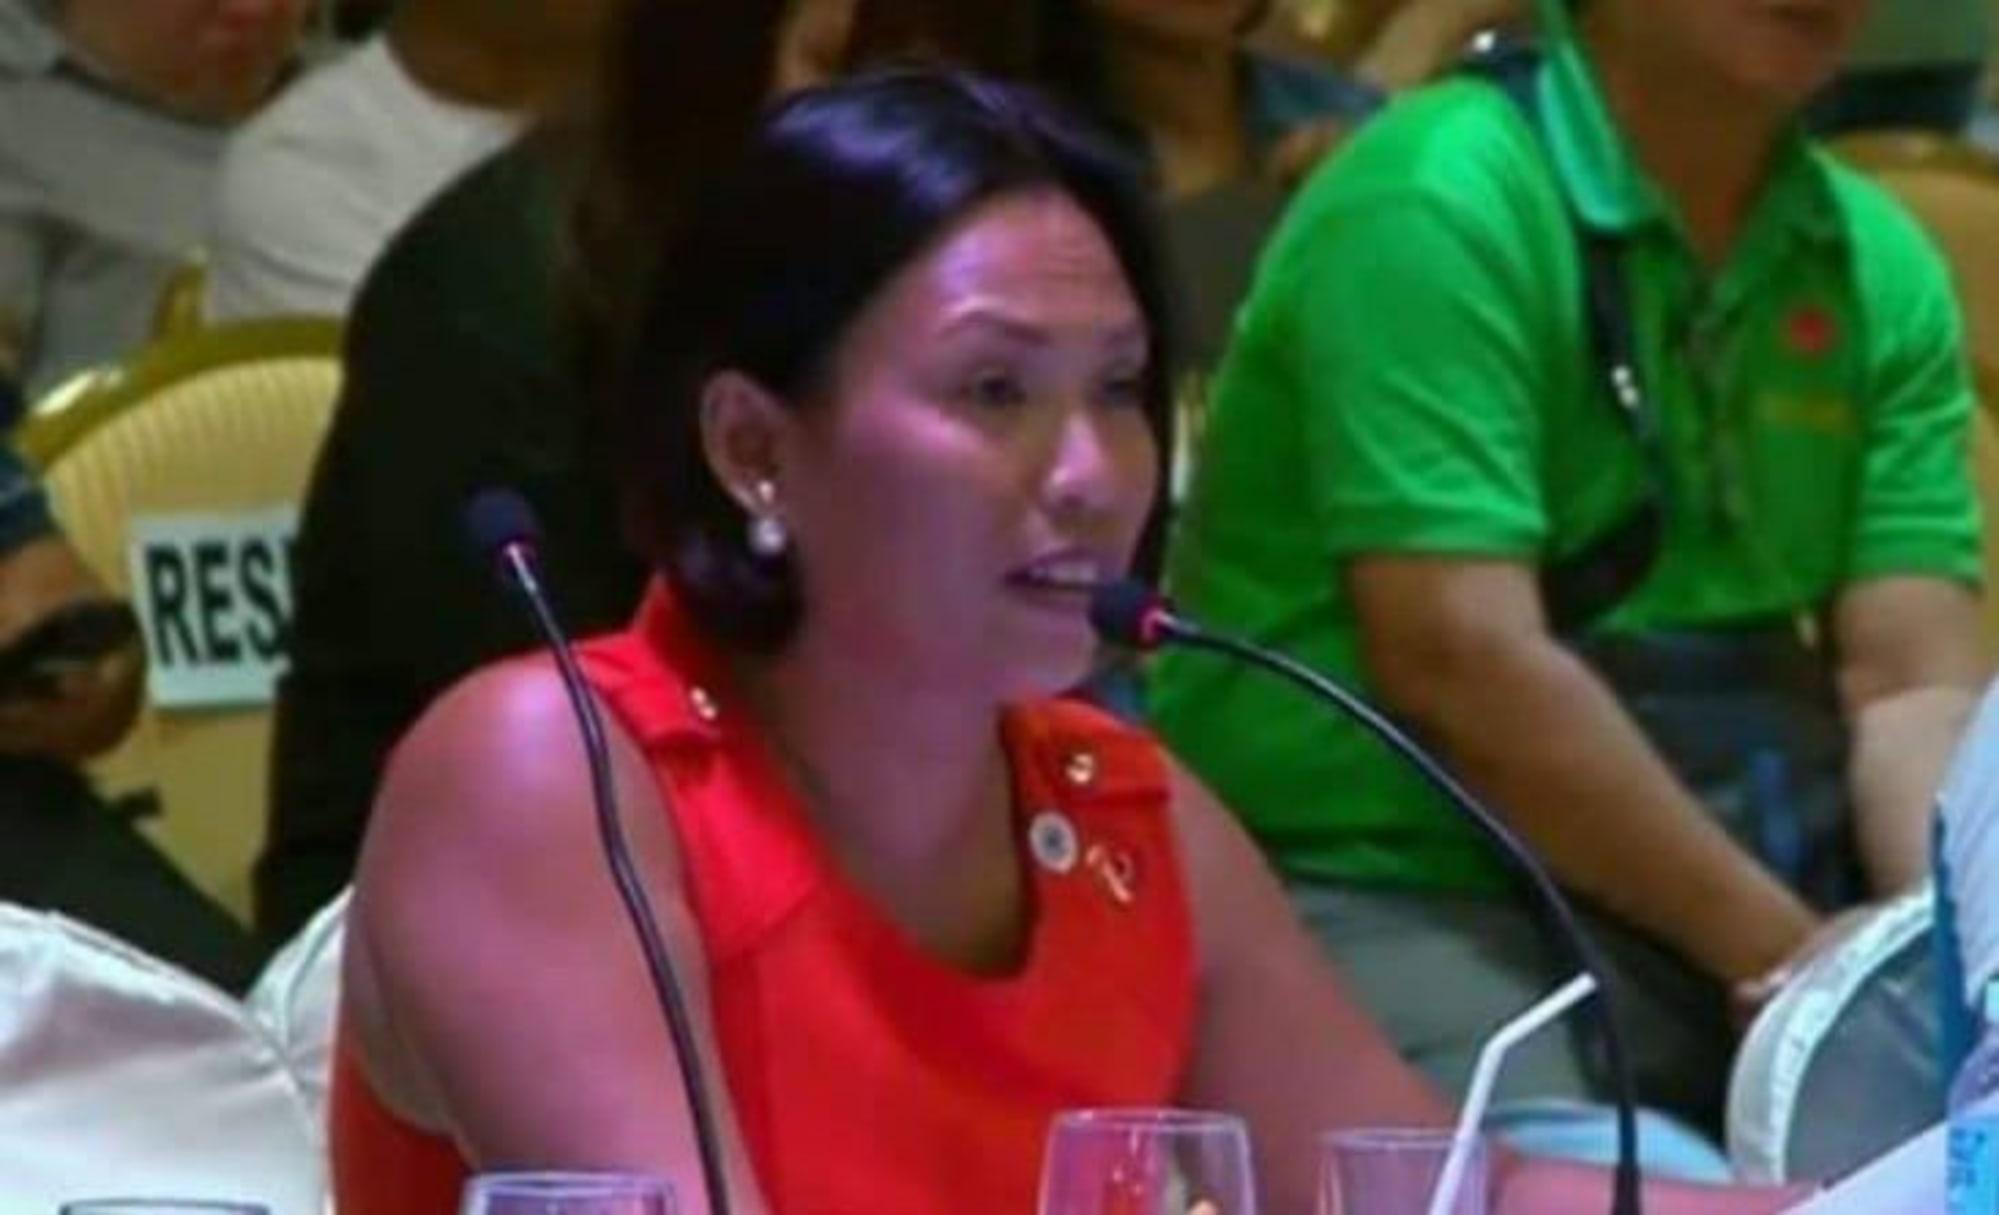 PCCI-Boracay supports BIDA, too, but wants an apolitical administrator